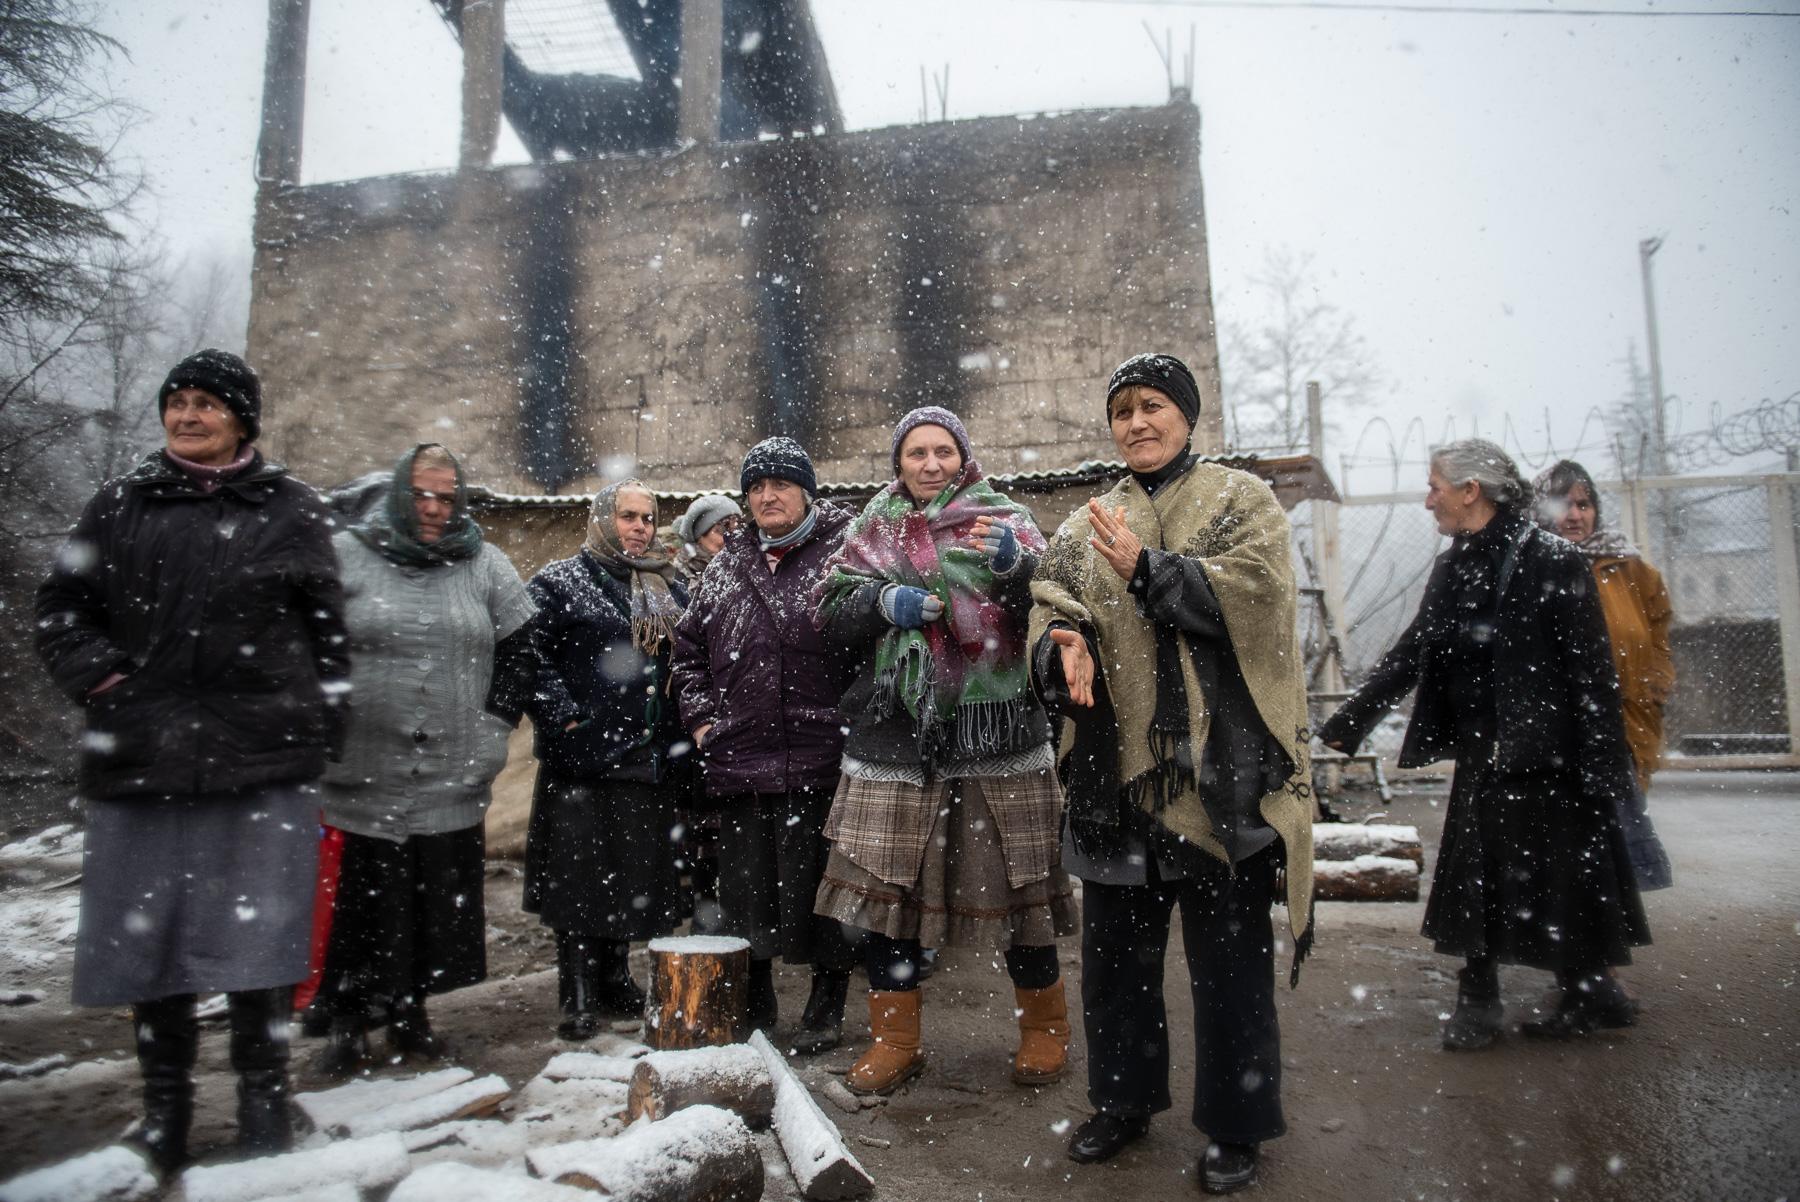 Protesters at their camp in November 2020. Photo: Mariam Nikuradze/OC Media.